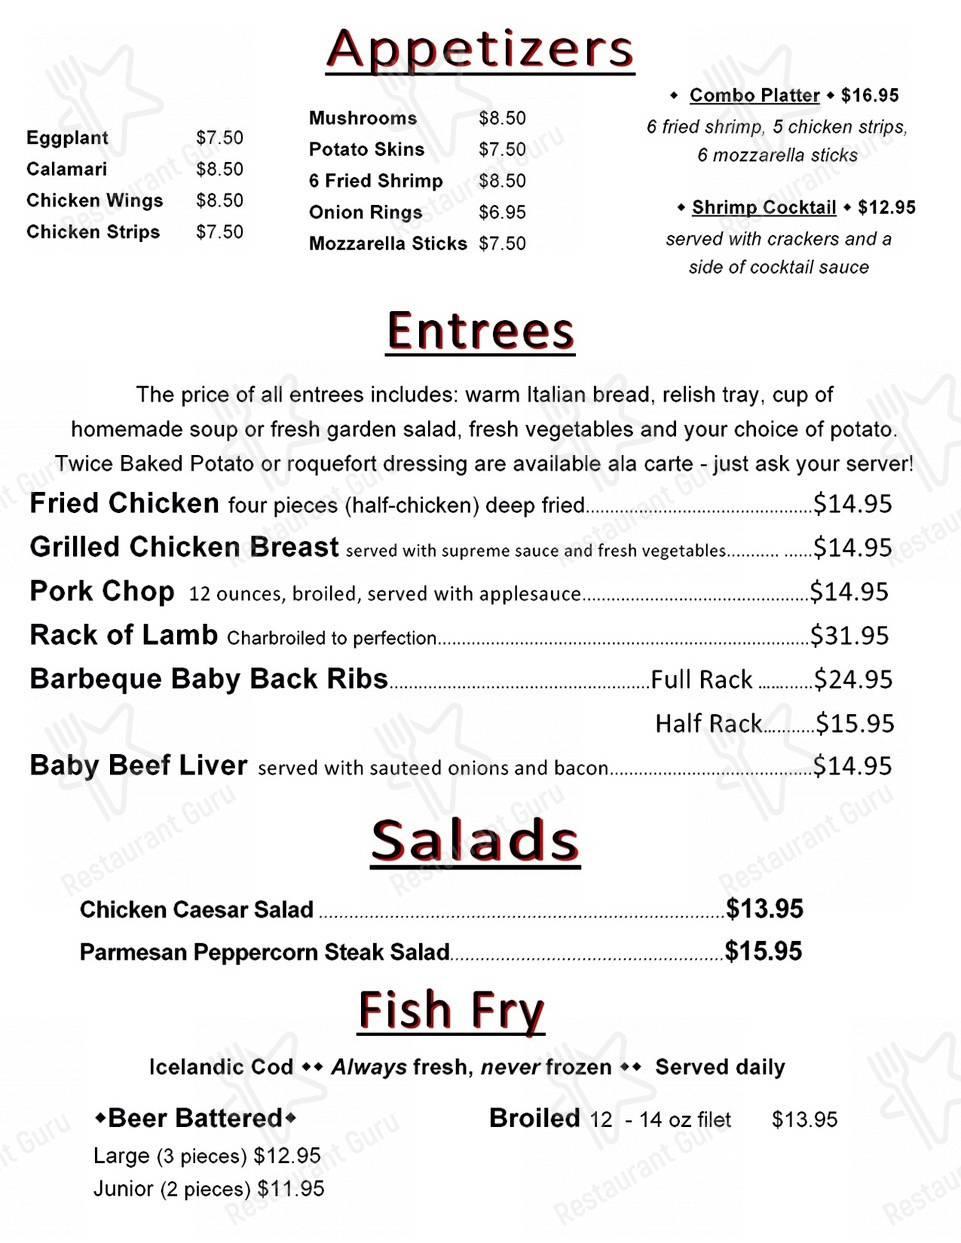 Diamond Jim's Steakhouse menu - meals and drinks